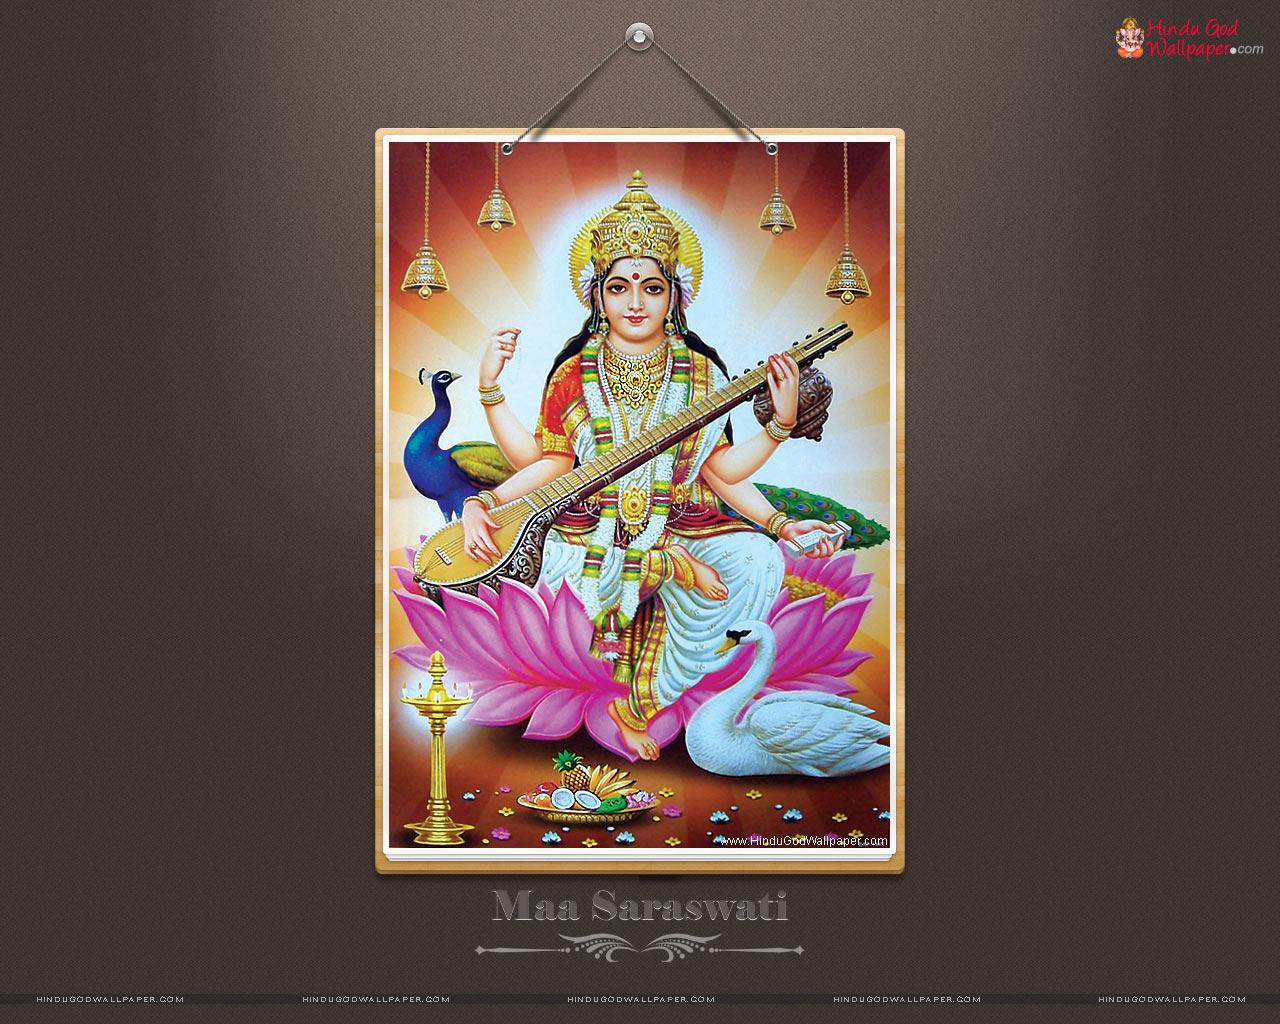 Saraswati Puja SMS, Wishes, Messages, Status 2014